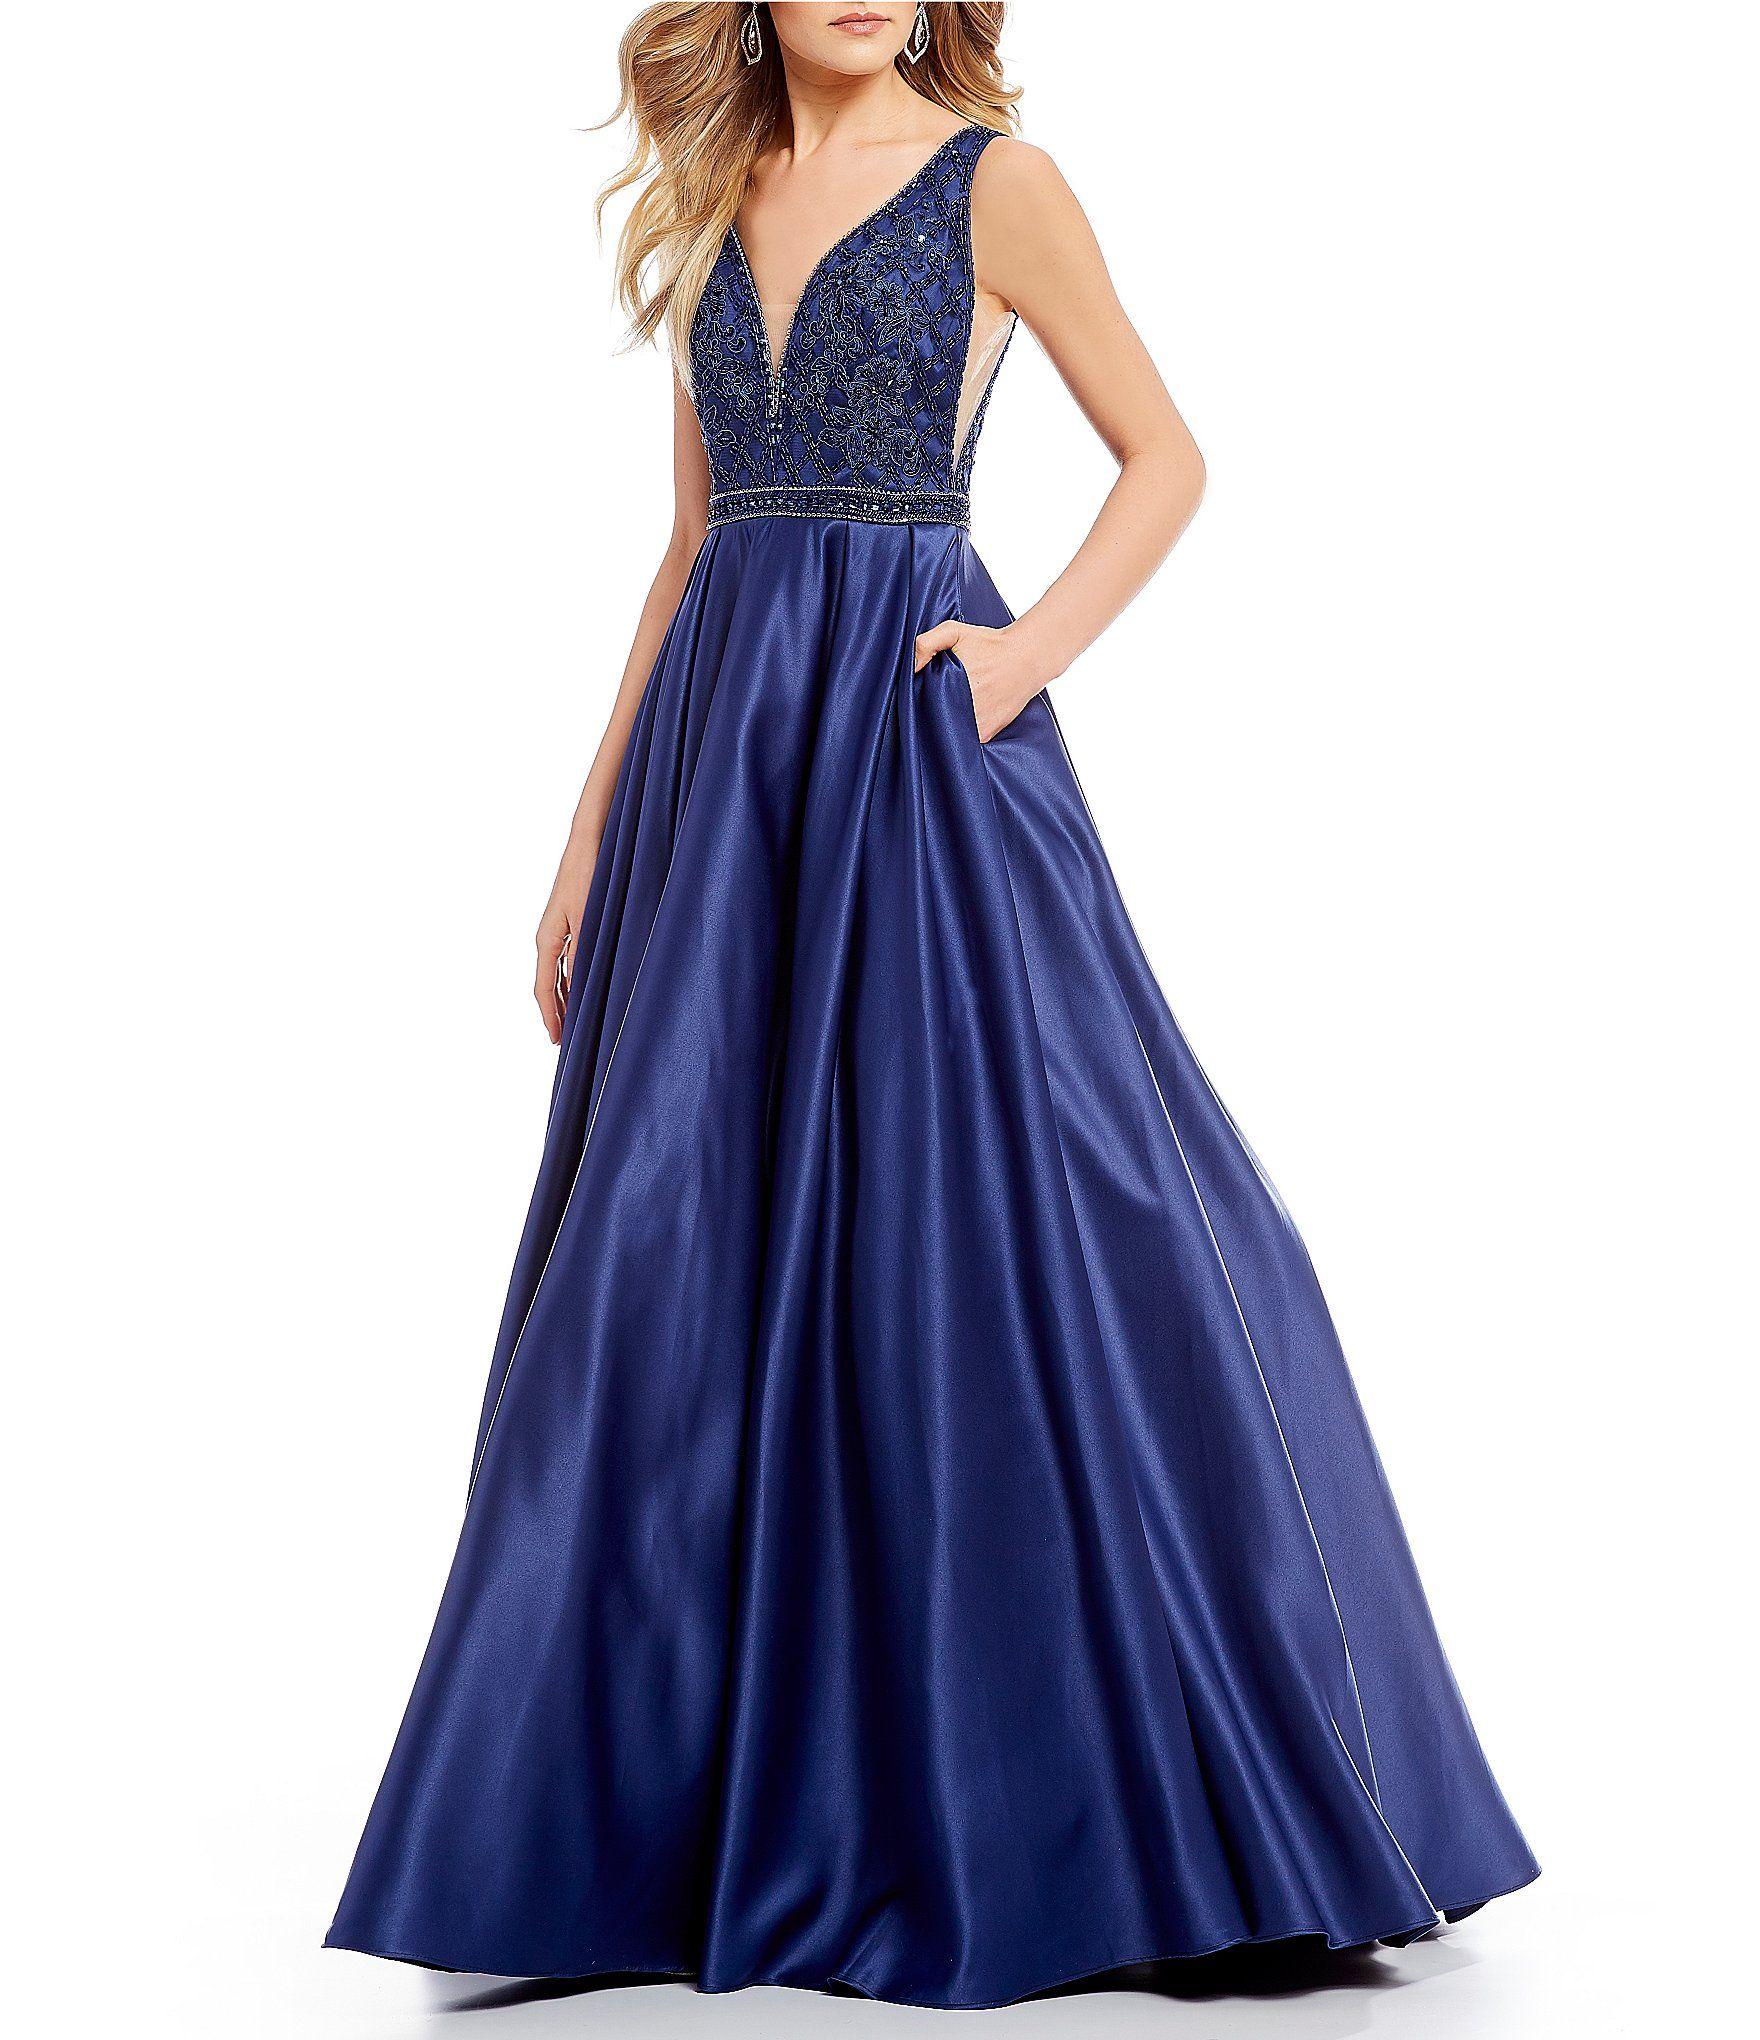 Coya Collection Deep-V Beaded Bodice Ball Gown   Dillards, Ball ...